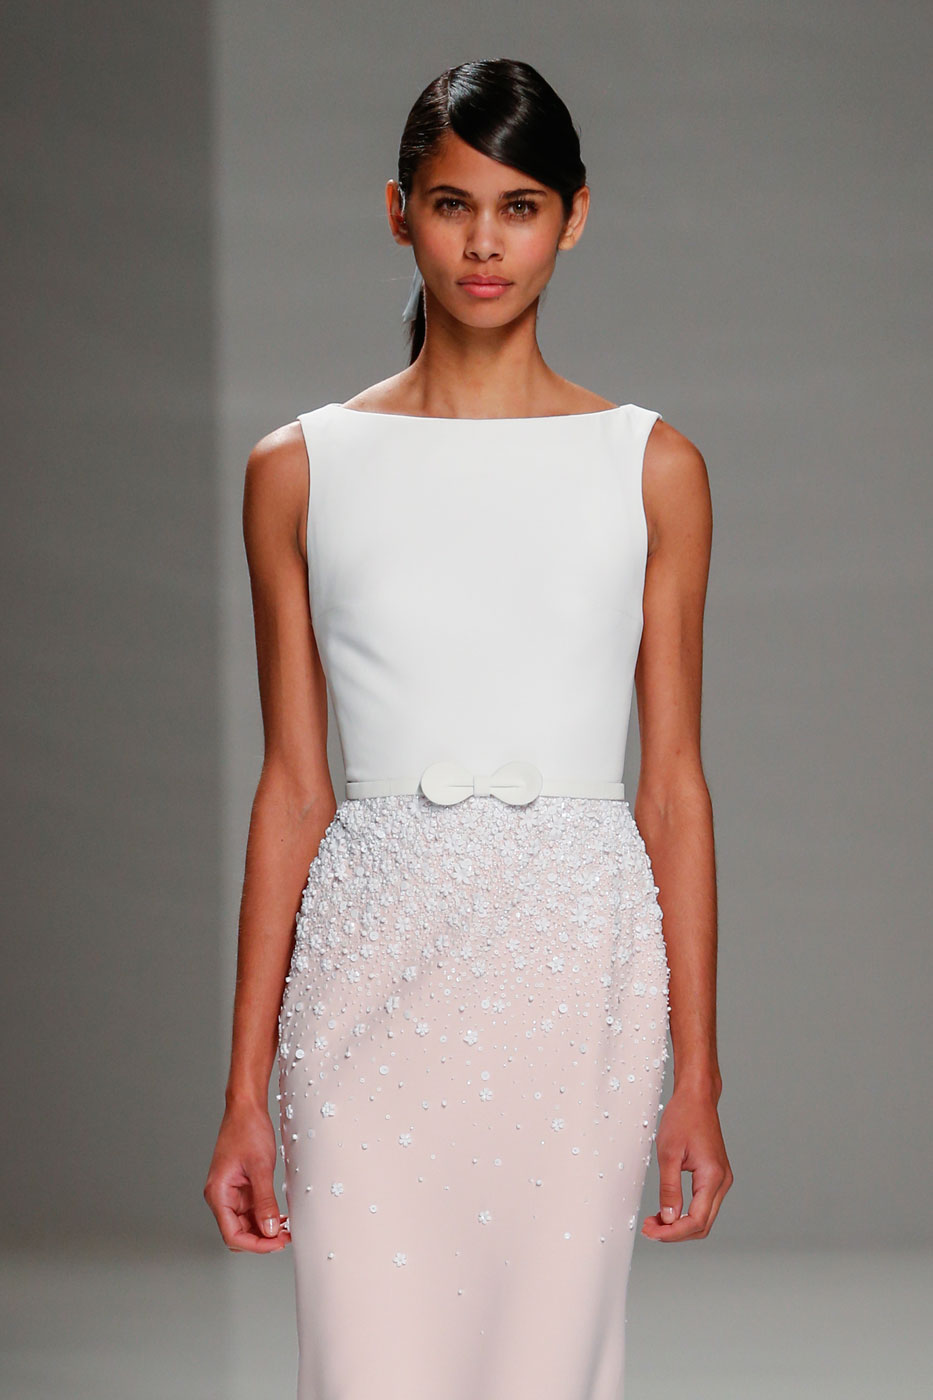 Georges-Hobeika-fashion-runway-show-haute-couture-paris-spring-2015-the-impression-72